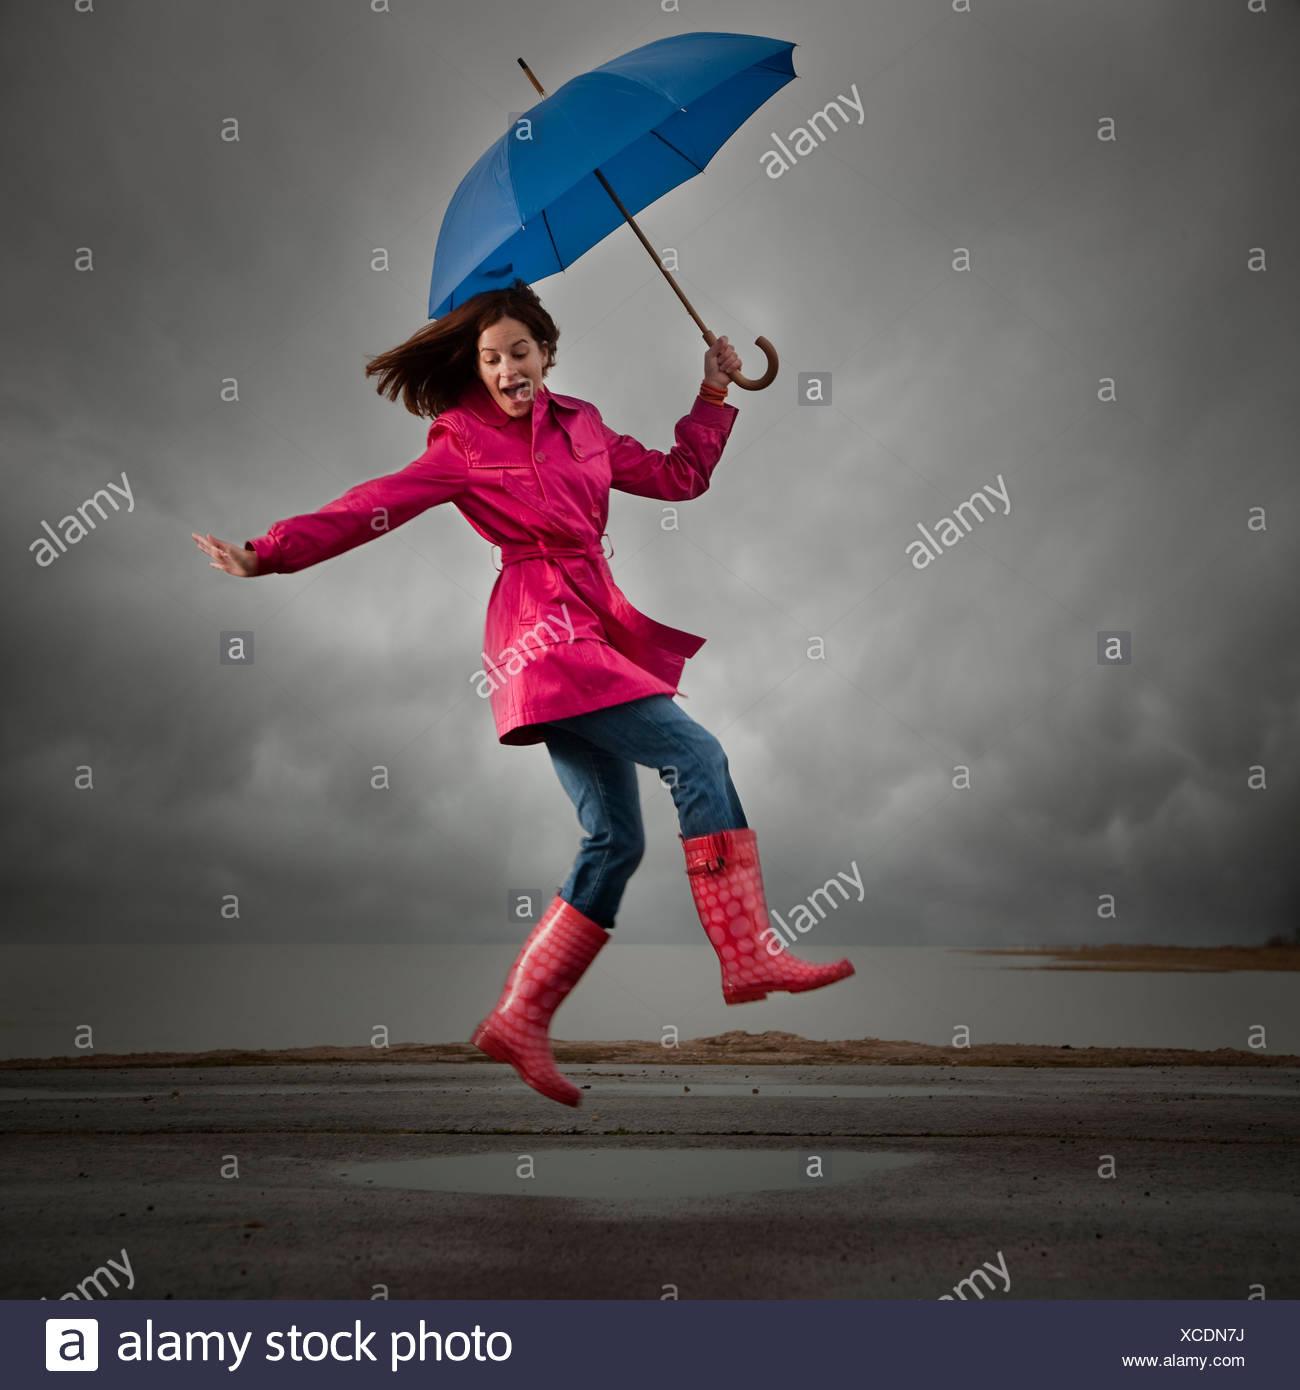 USA, Utah, Orem, woman with umbrella jumping under overcast sky - Stock Image